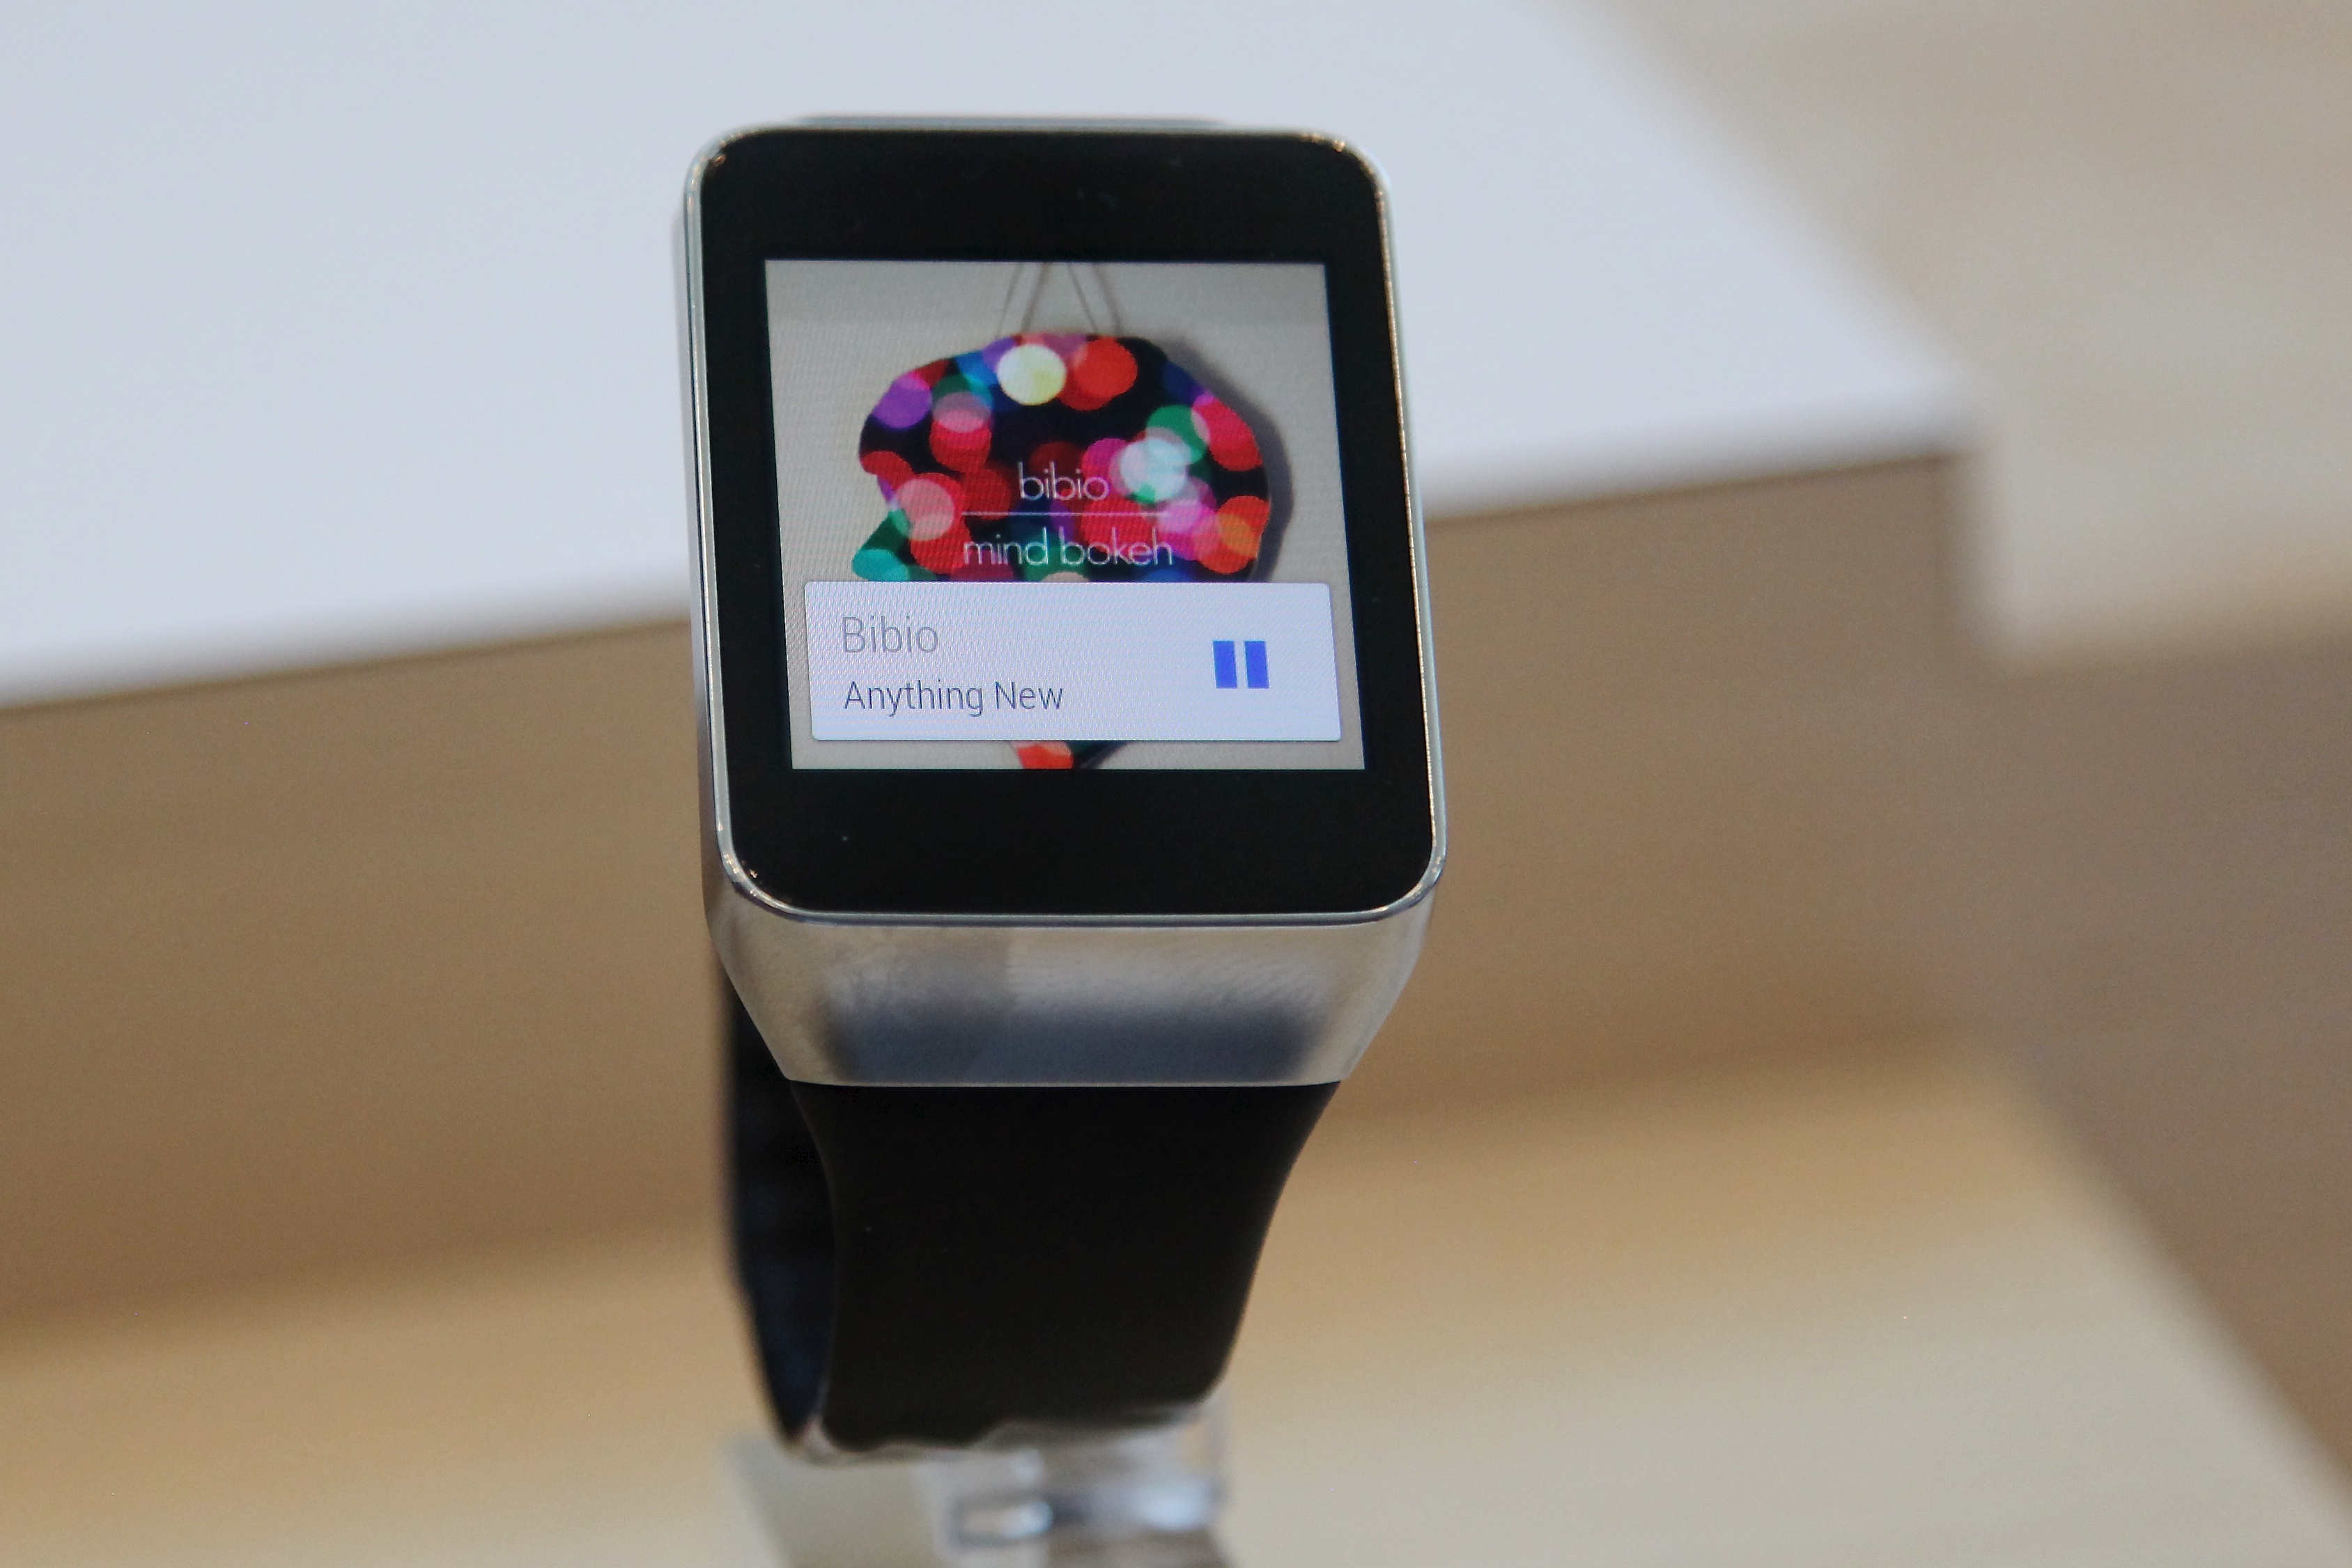 Google I/O Samsung Gear Live